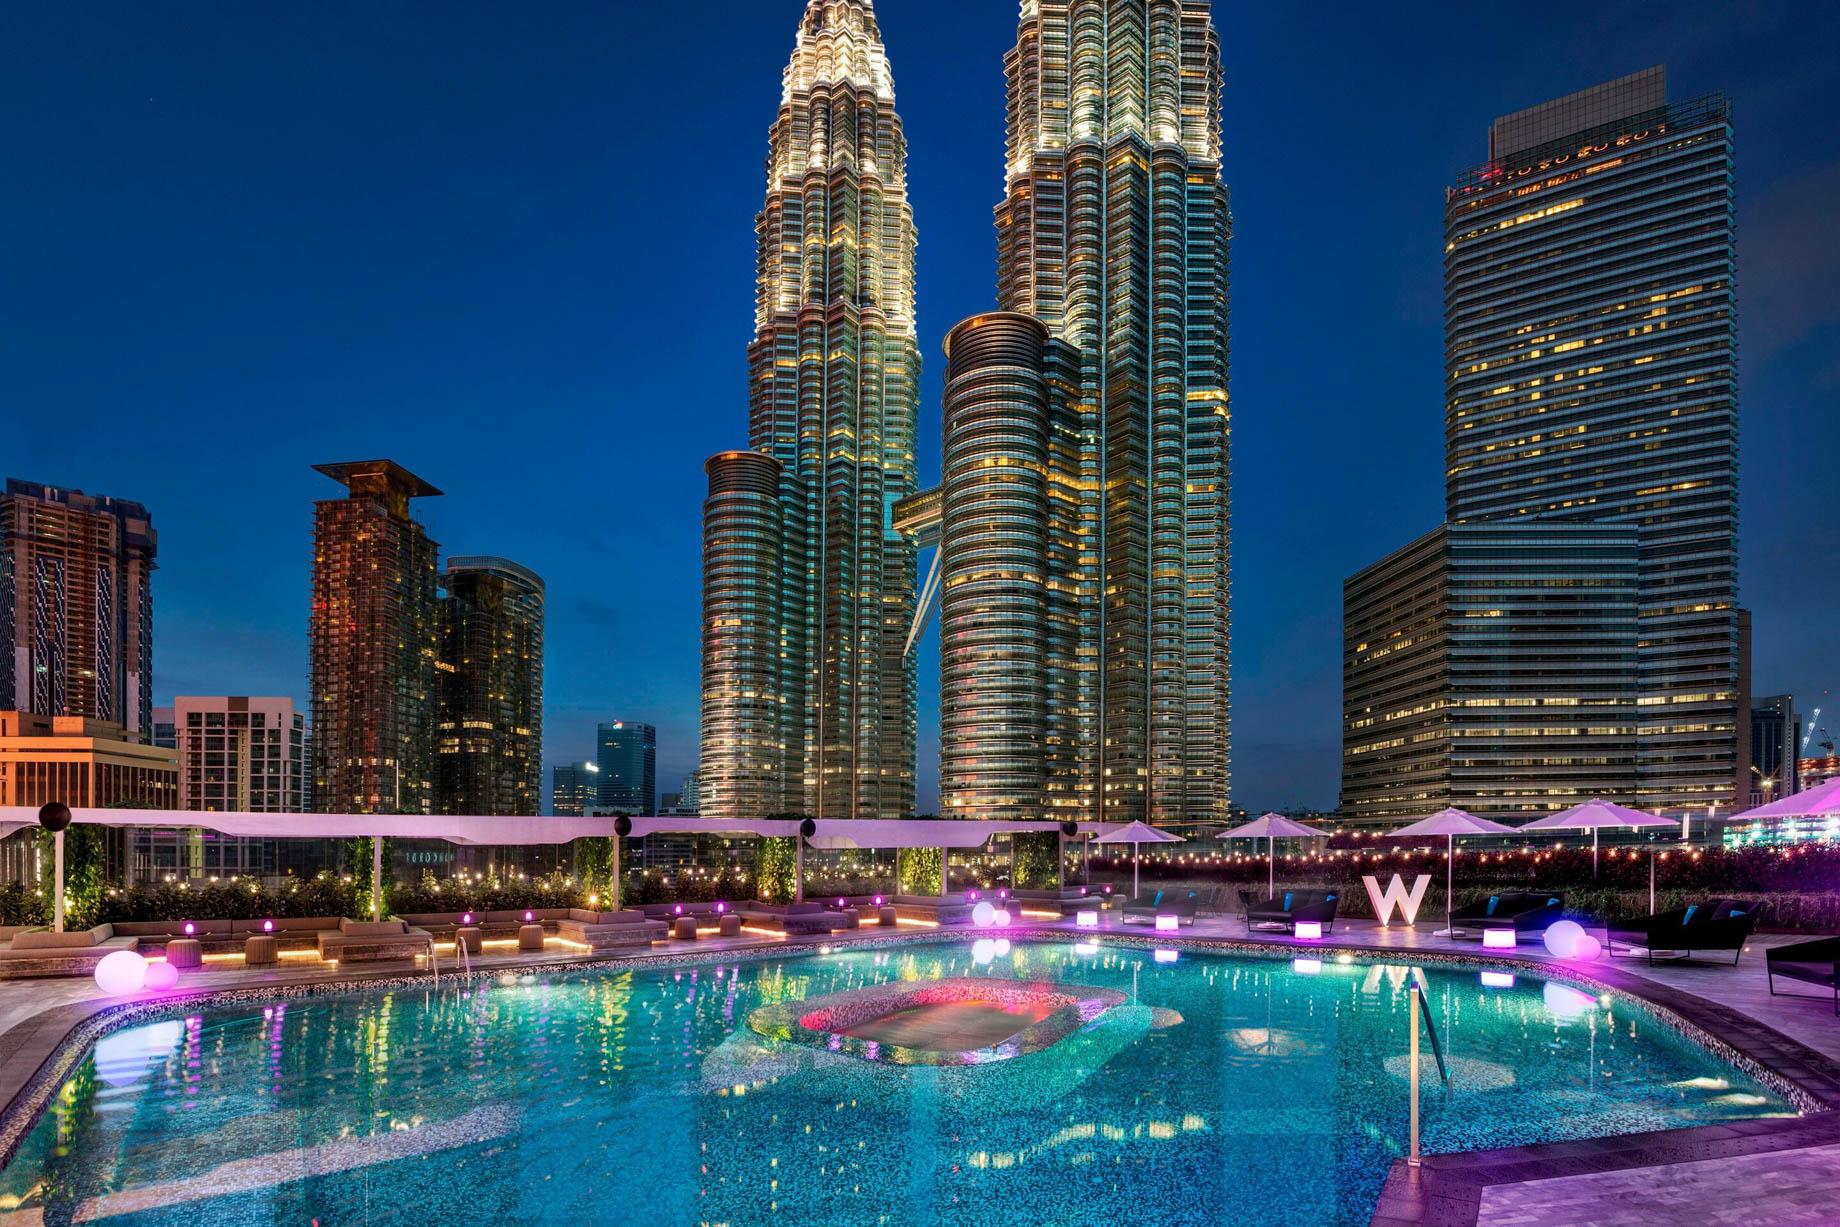 W Kuala Lumpur Luxury Hotel - Kuala Lumpur, Malaysia - WET Outdoor Pool Petronis Towers Night View